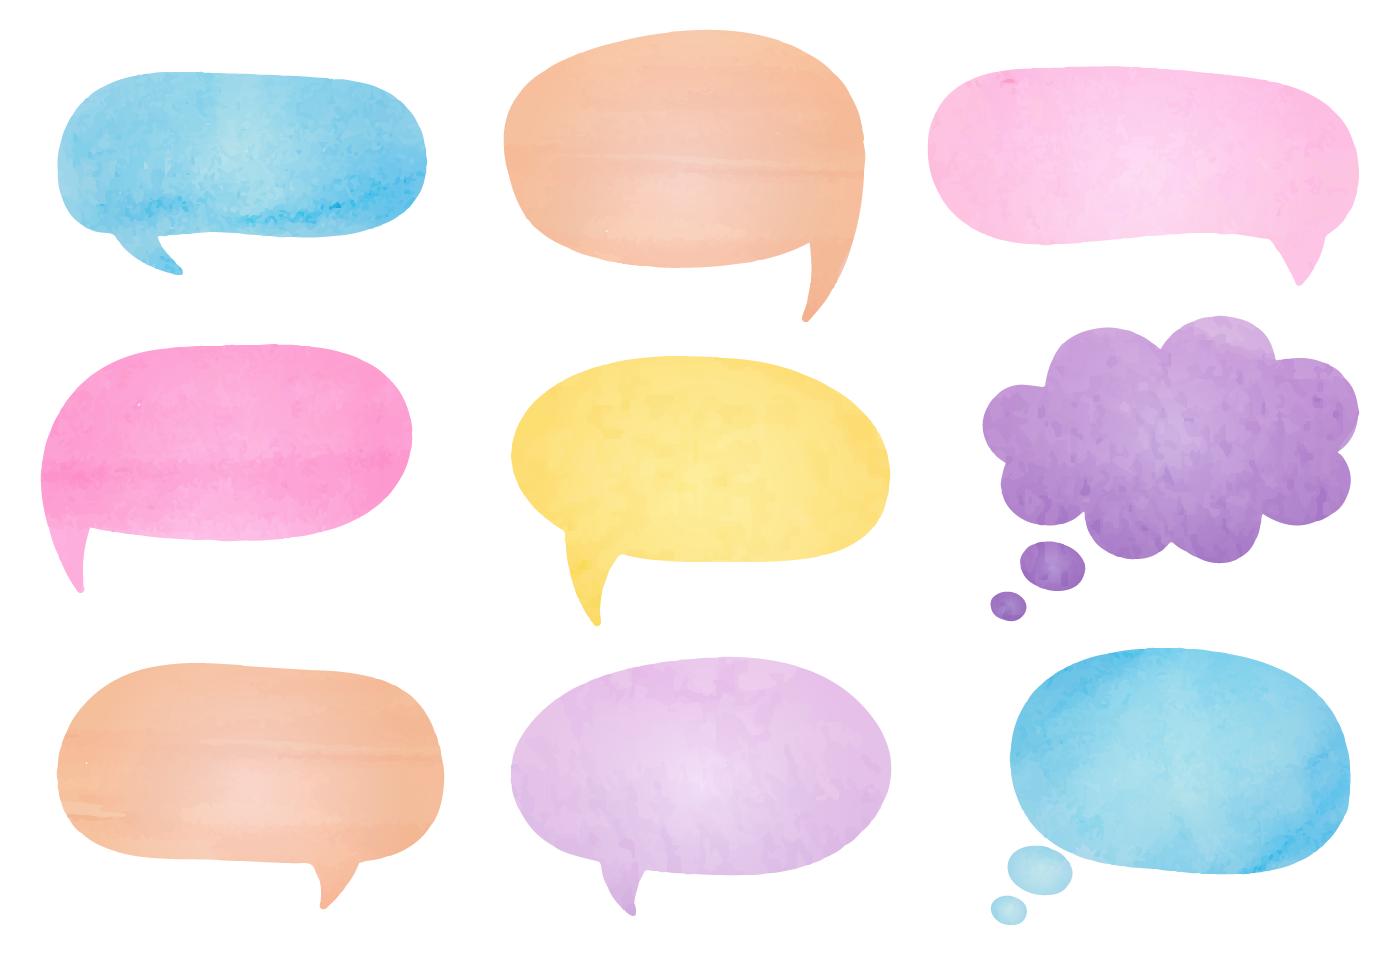 Watercolor Speech Bubbles Free Vector Art - (32 Free Downloads)